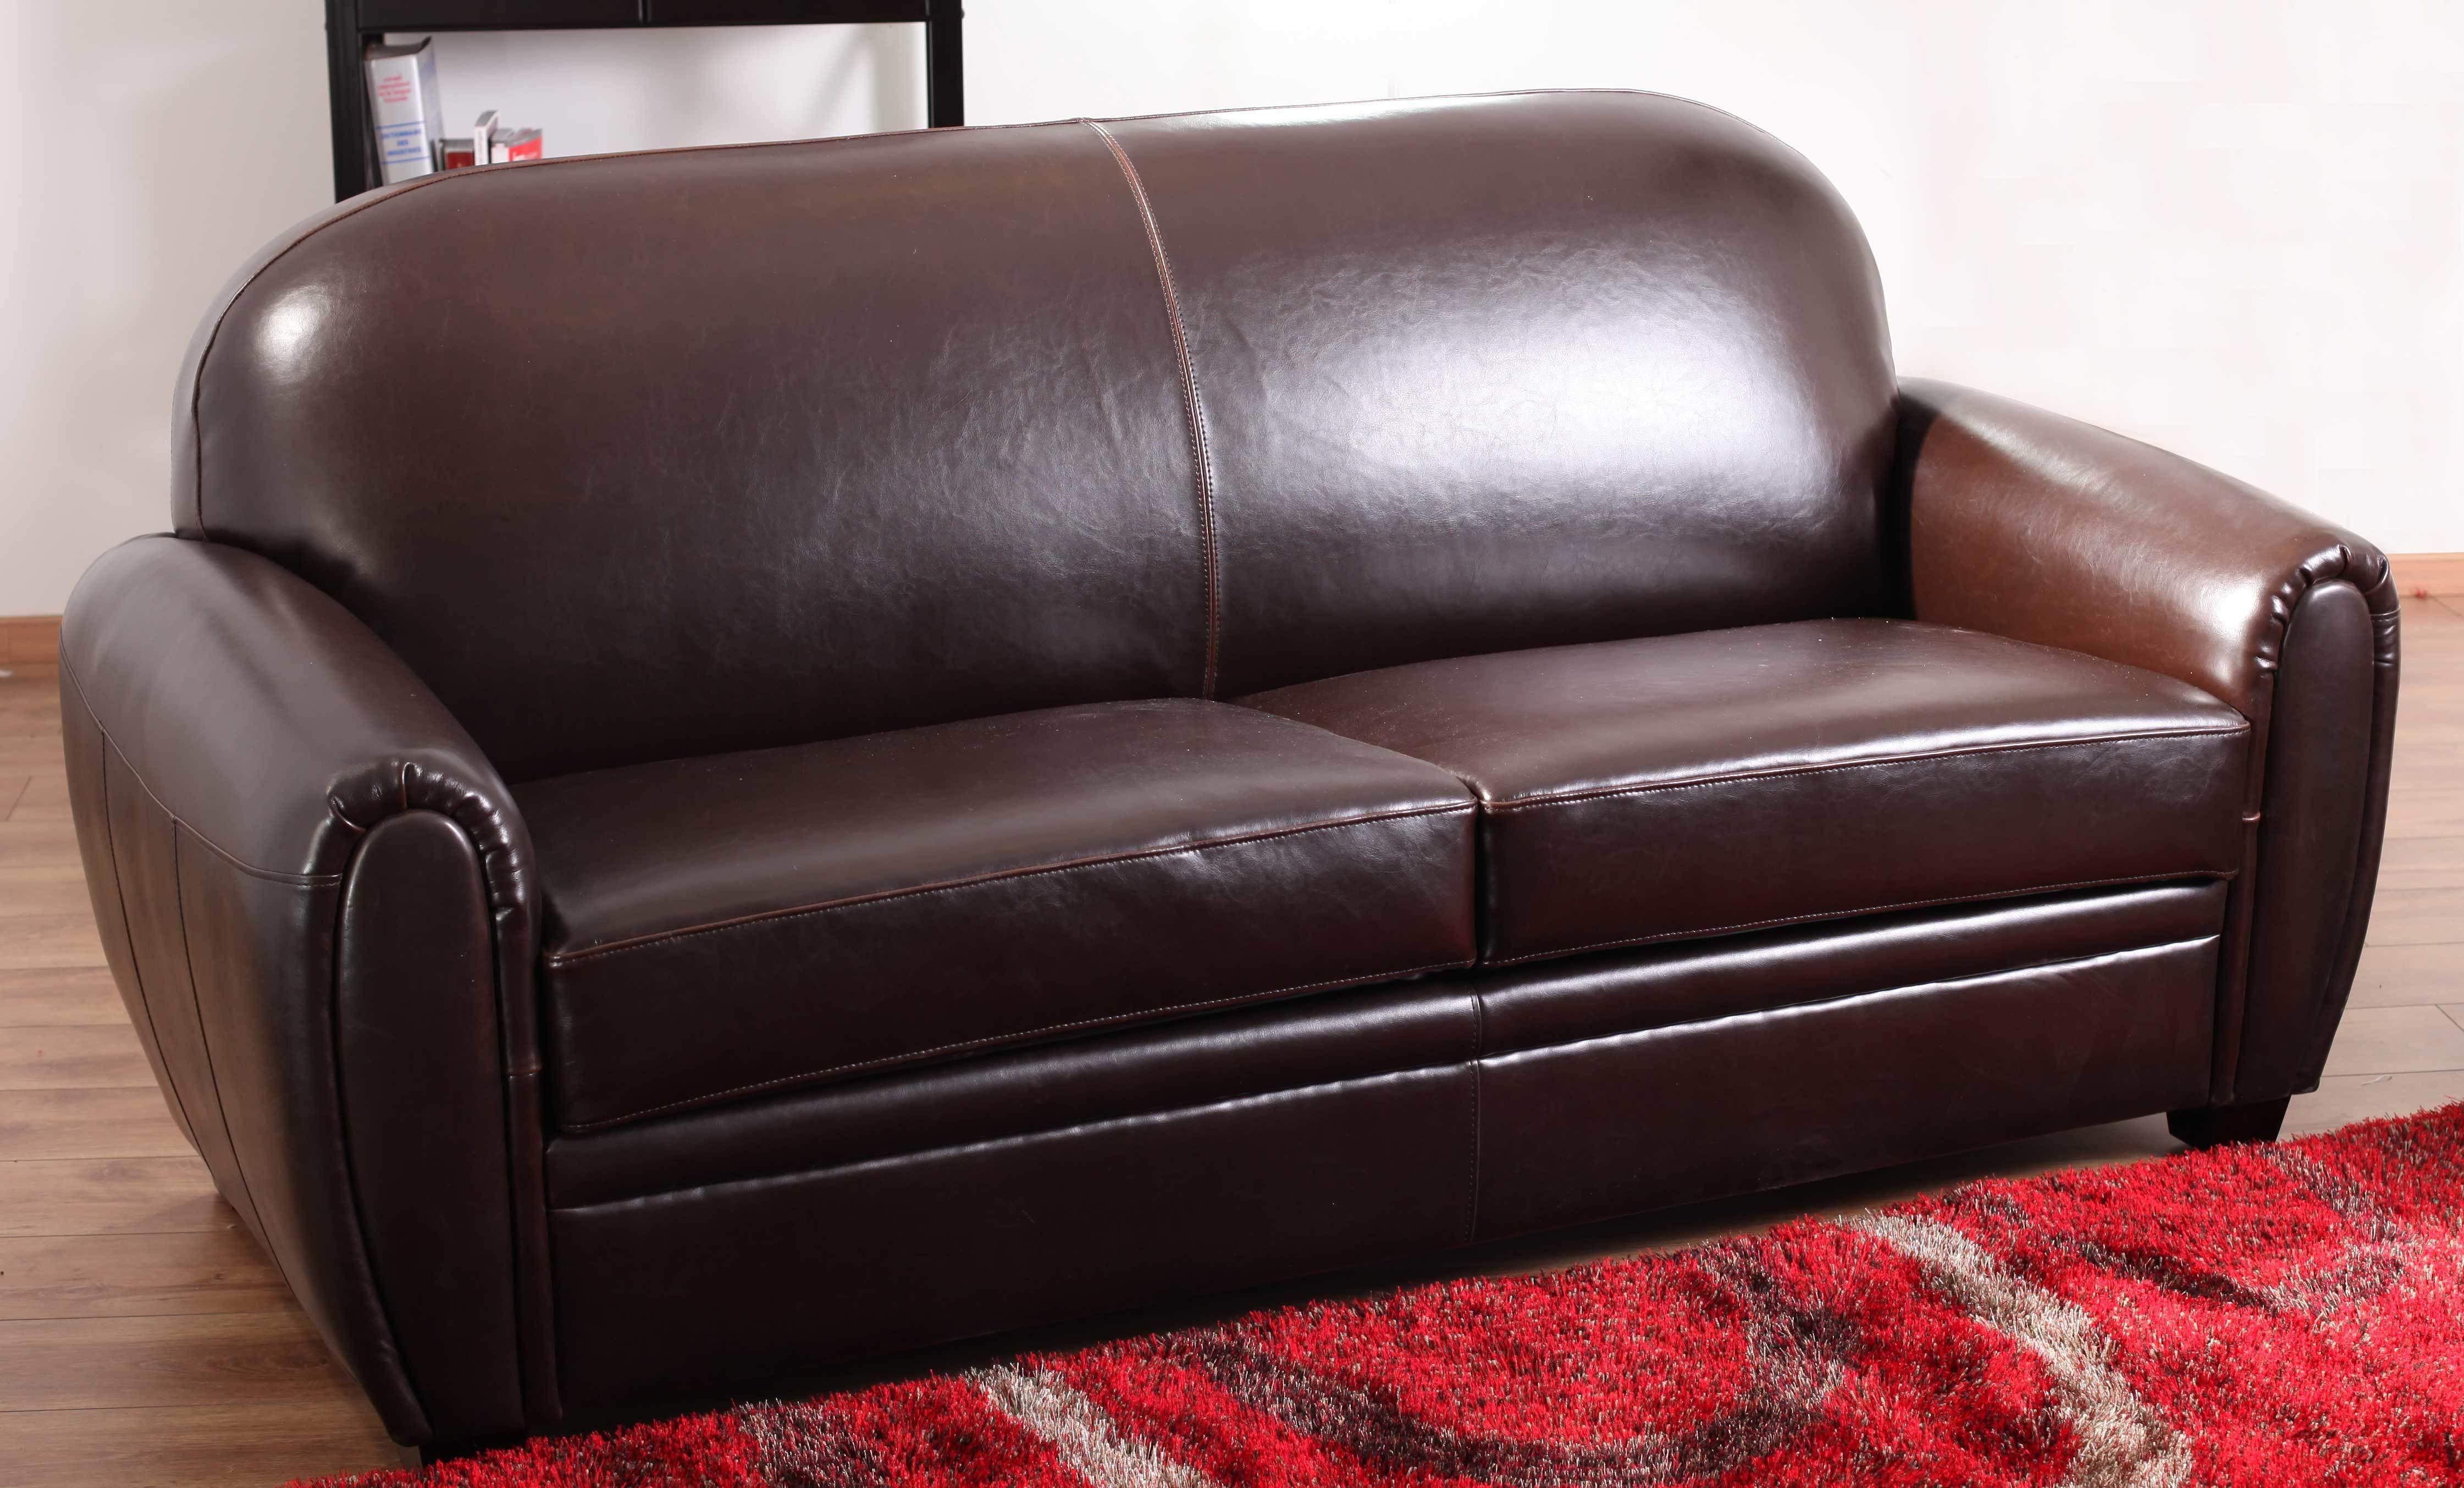 canap cuir vieilli marron free canap duangle cuir marron vieilli with canap cuir vieilli marron. Black Bedroom Furniture Sets. Home Design Ideas